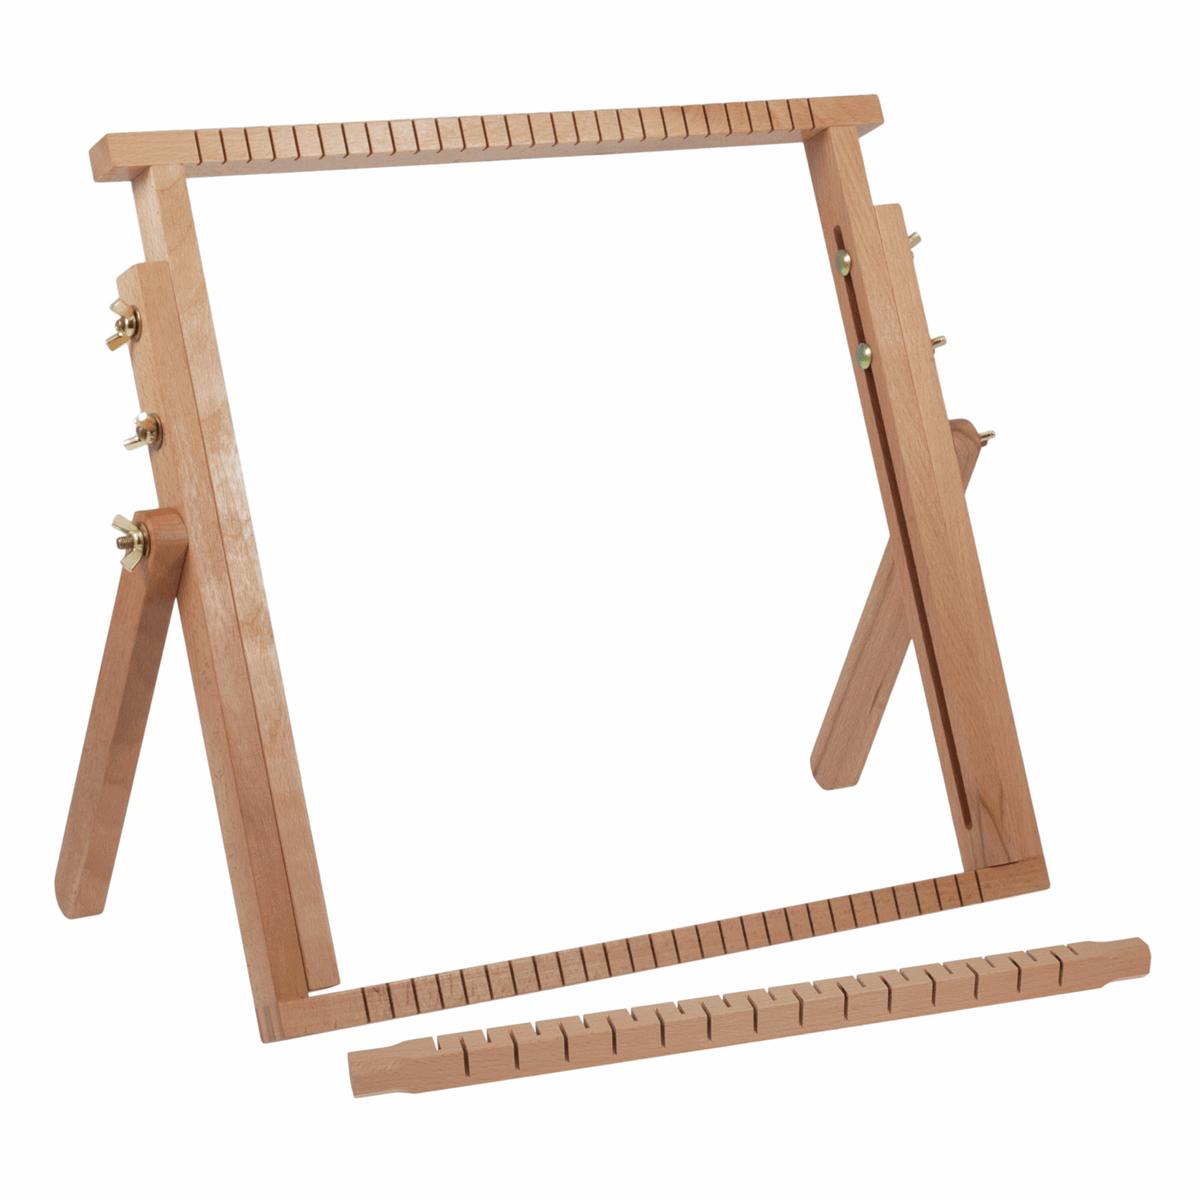 Extendable Weaving Loom Beech Wood Craft Weave Textiles